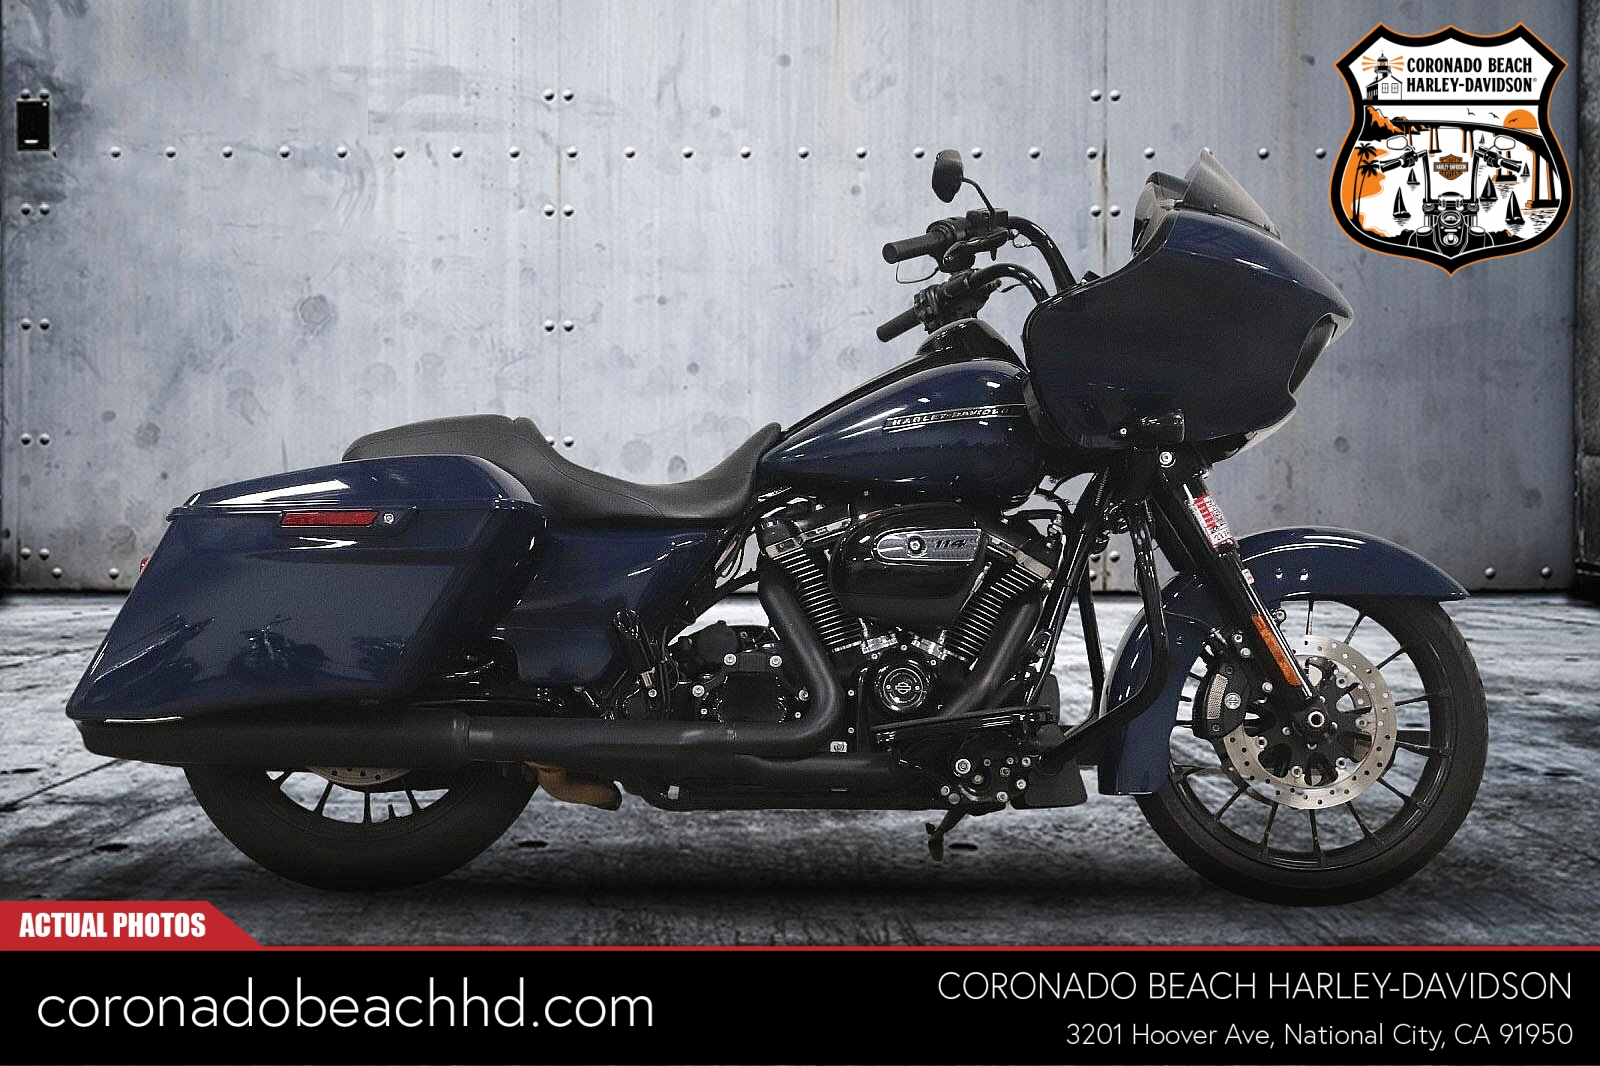 2019 Harley-Davidson Road Glide Special [82]